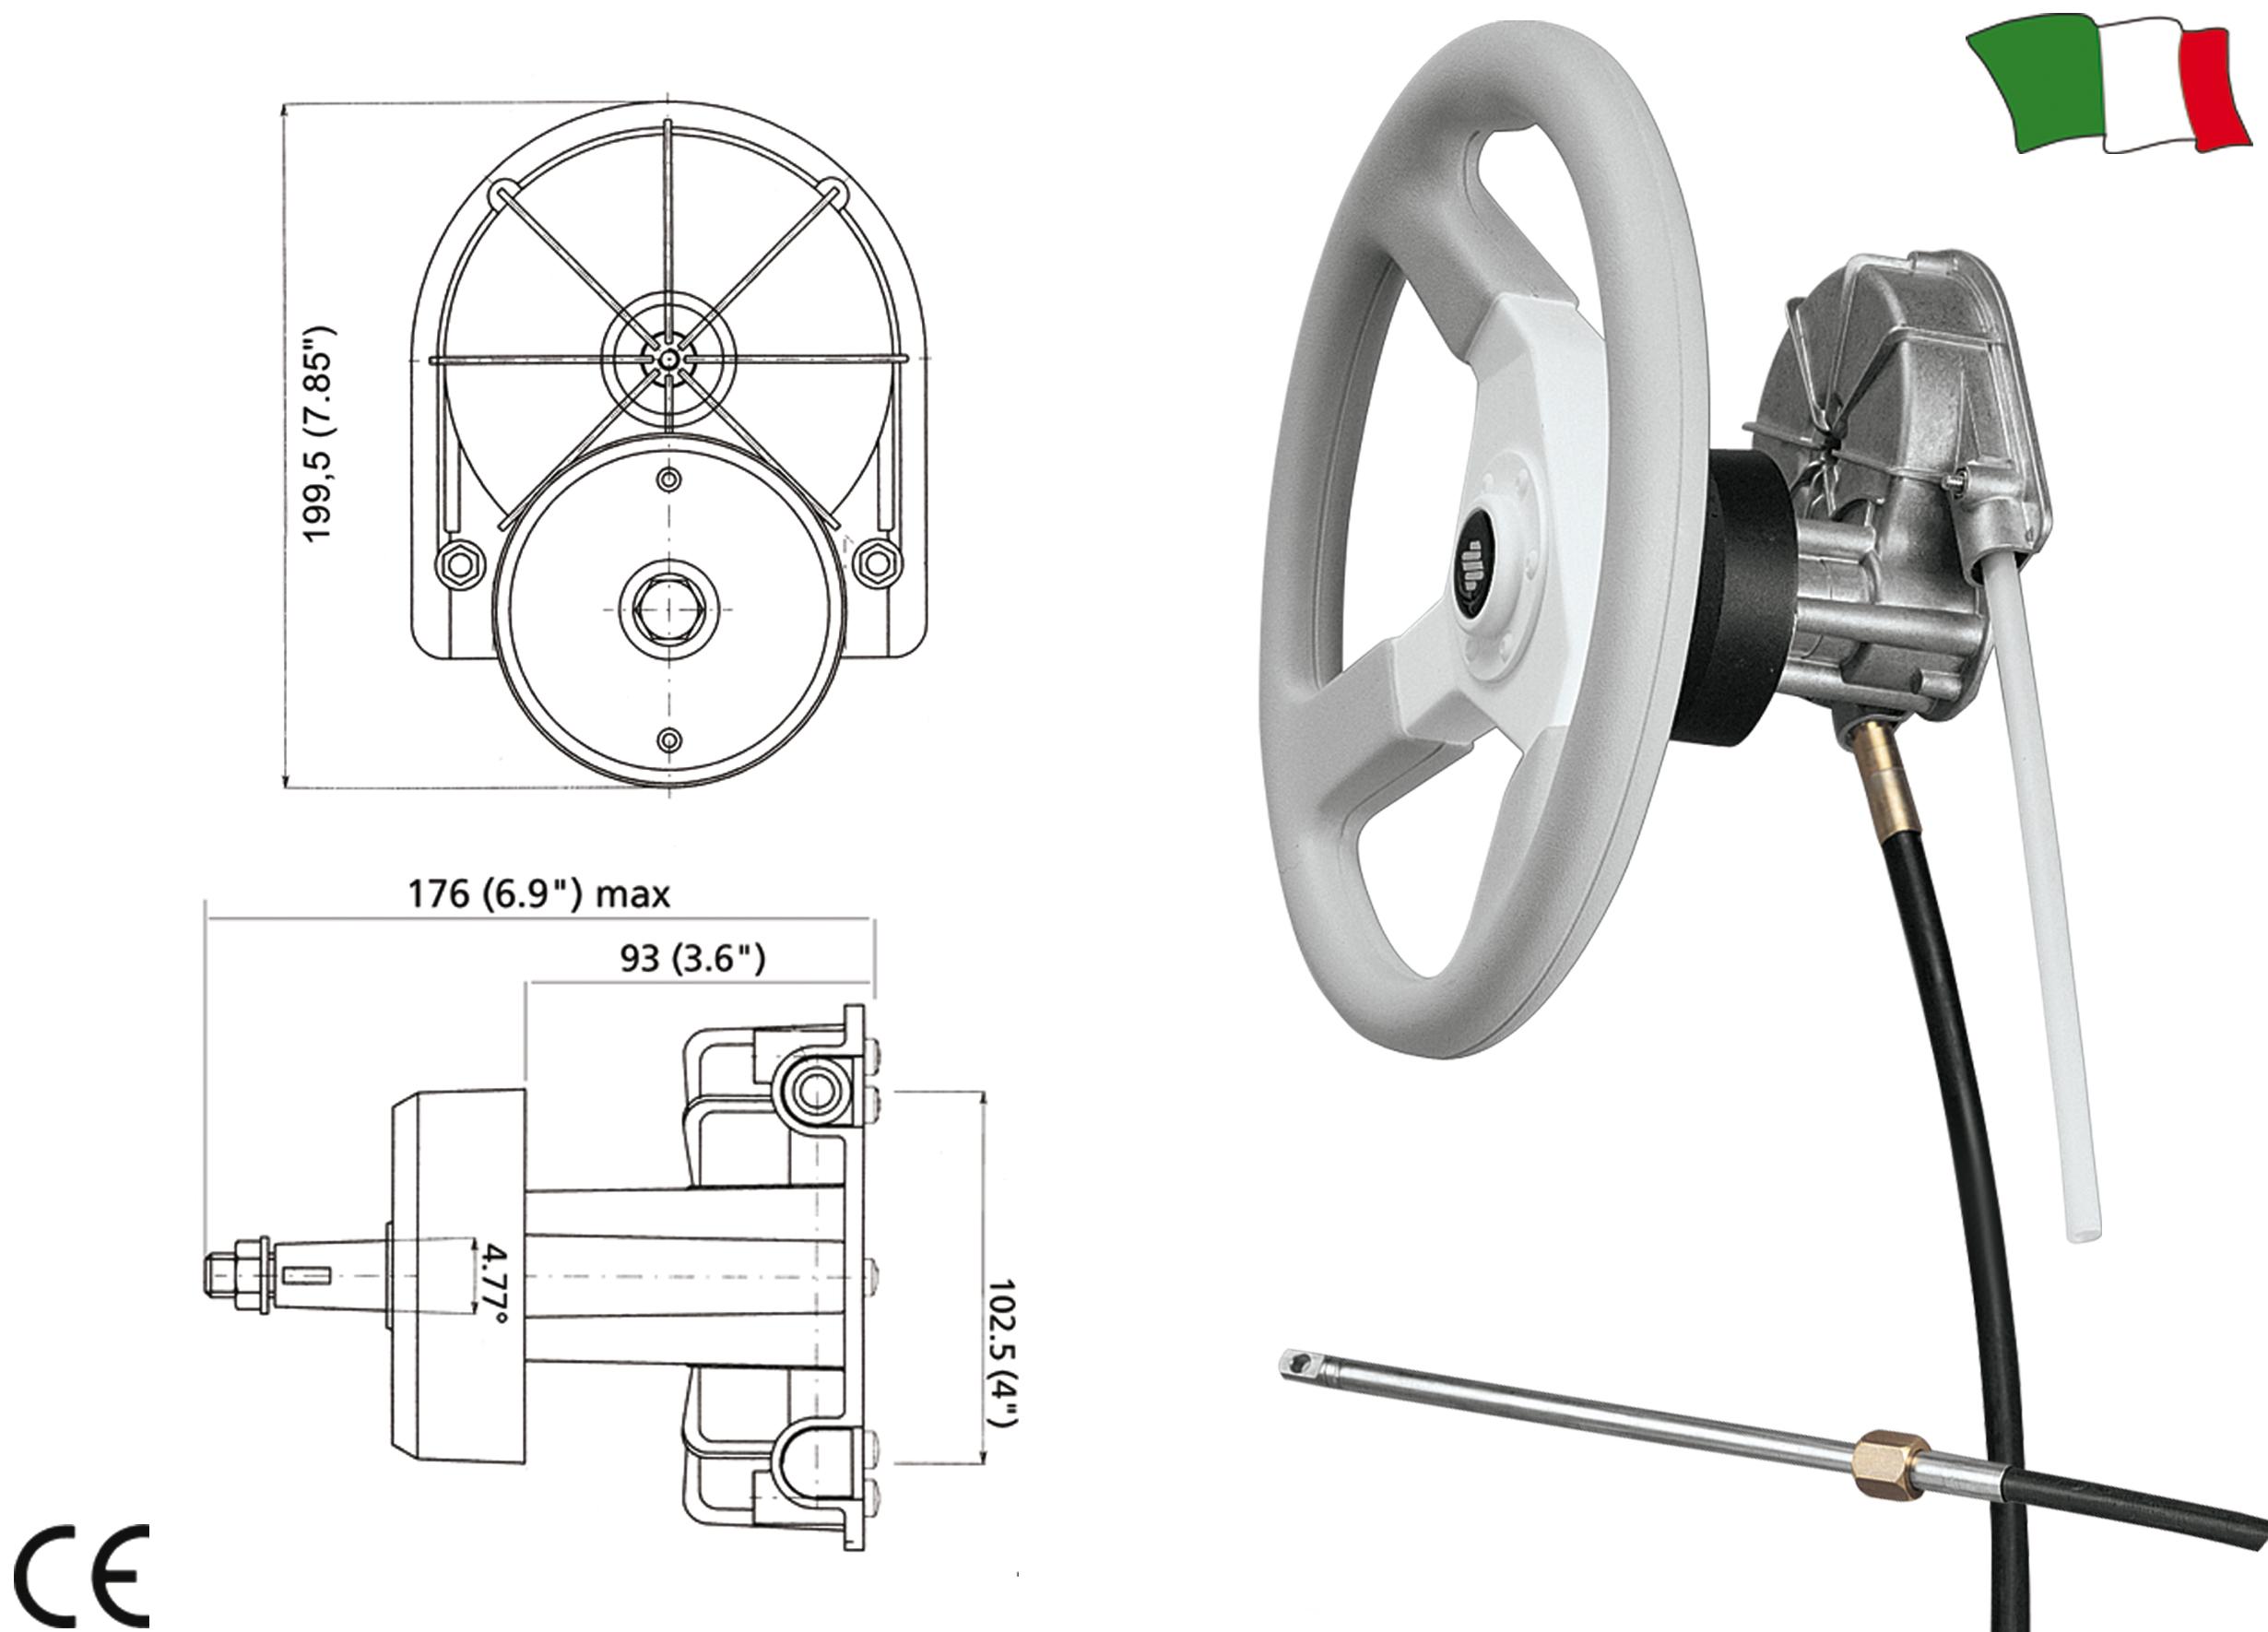 Ultraflex T85 Steering System Gfn Gibellato Forniture Nautiche Jabsco Spotlight Wiring Diagram 128900